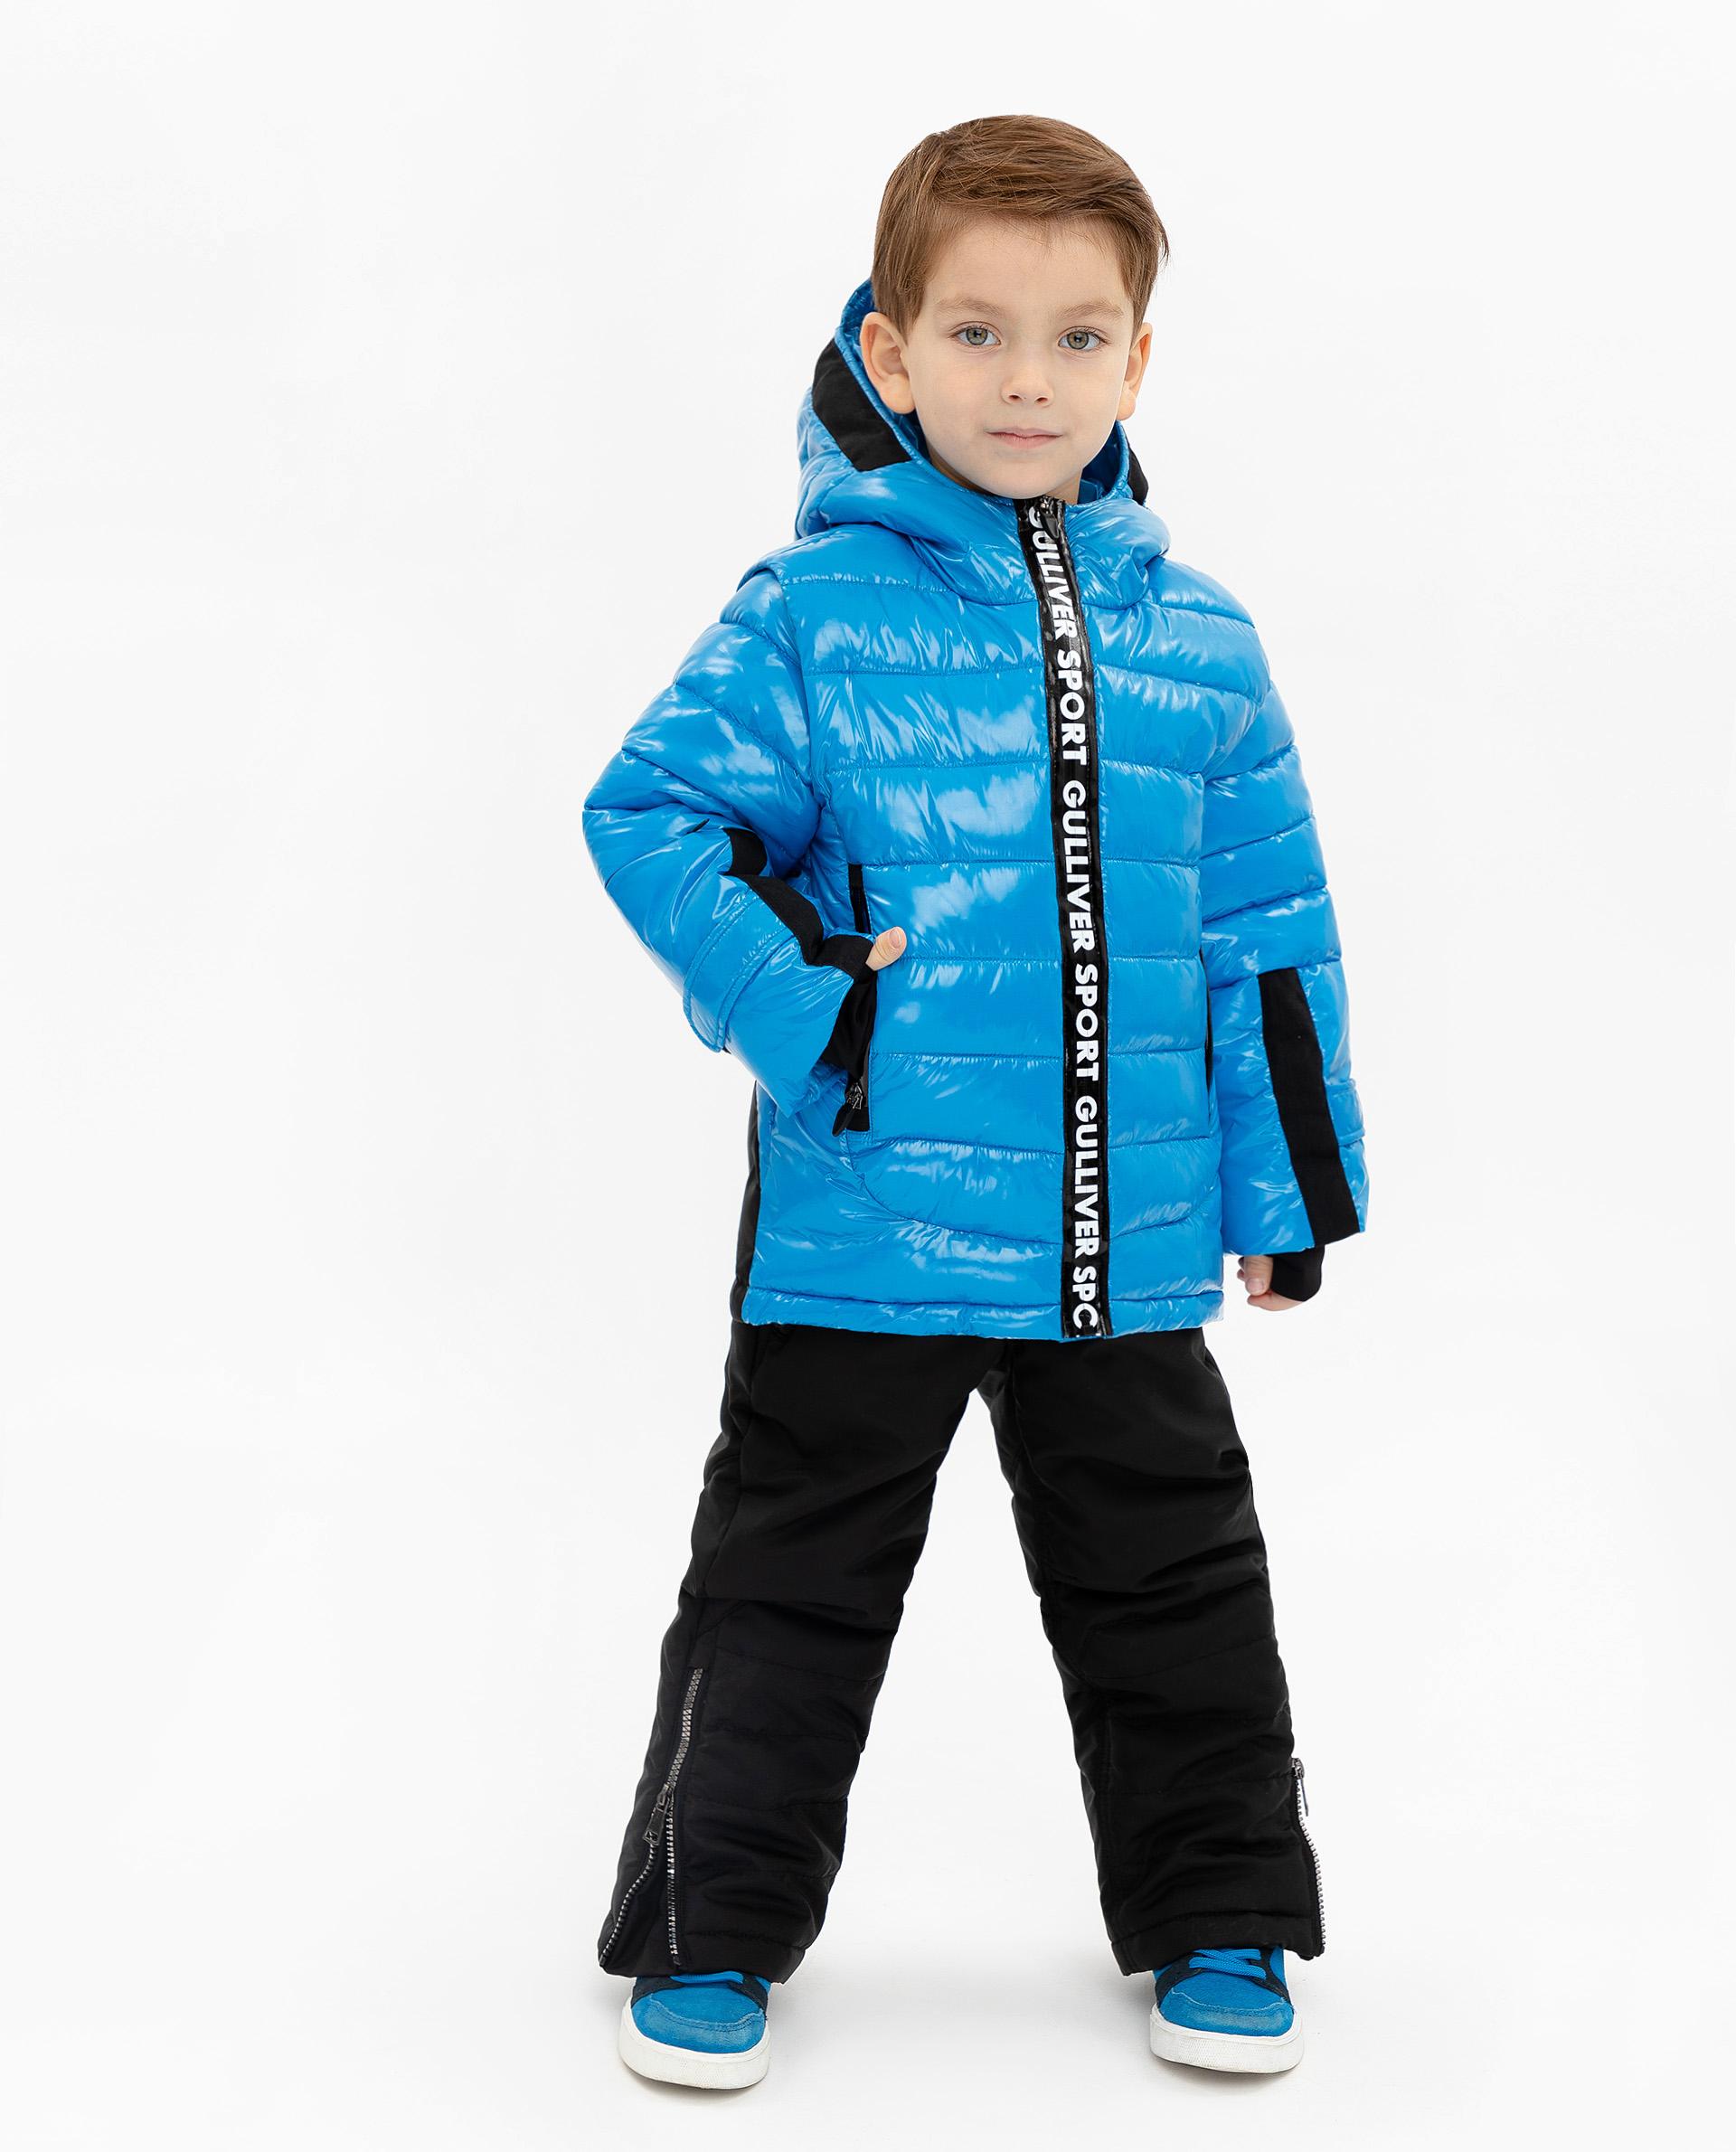 Купить 219FBC4102, Куртка для мальчиков Gulliver, цв. синий, р.140,